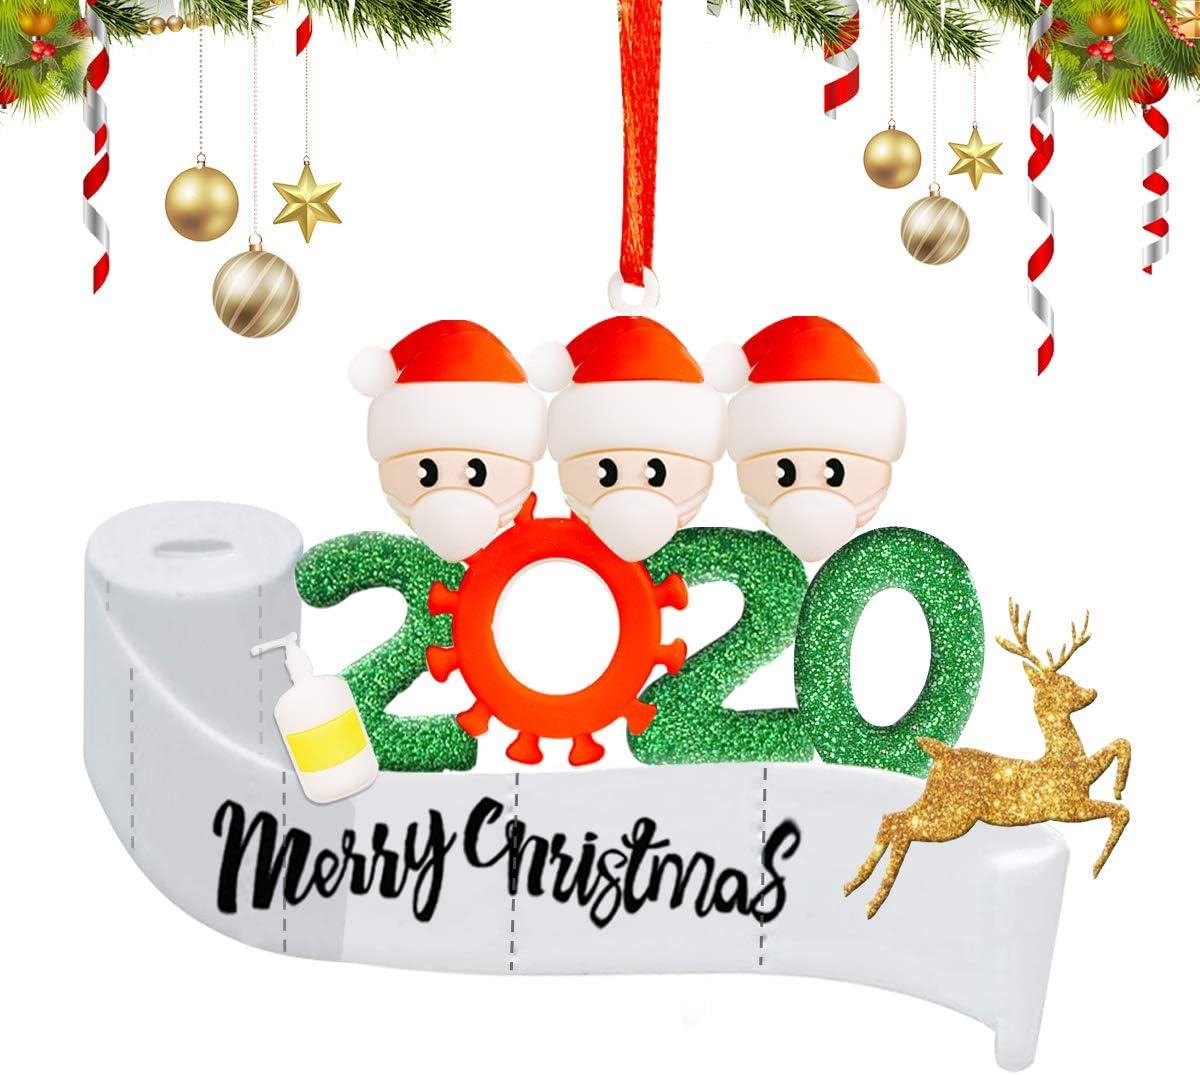 SlappyShirts Christmas Ornament Kit, Quarantine Survivor Personalized Name 2020 Christmas Ornament, Family of 4 Customized Christmas Decorating Set Holiday Creative Decorating Gift for Family